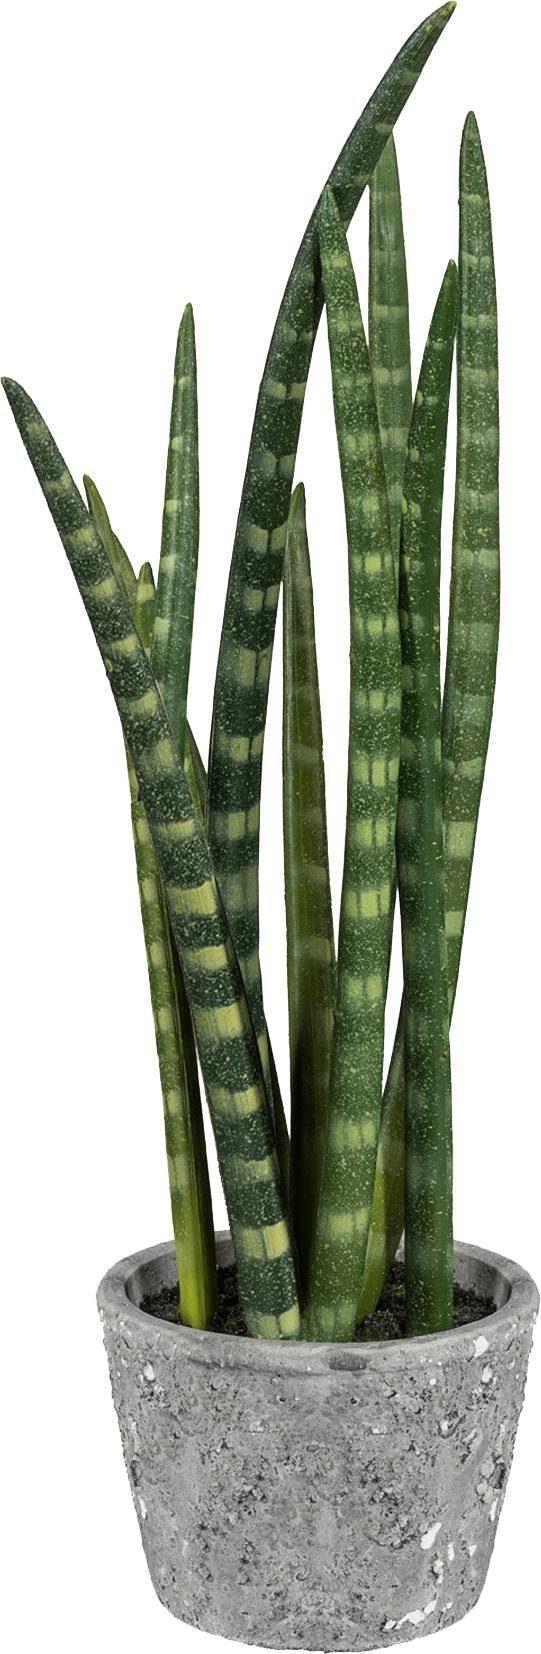 Home affaire Kunstpflanze »Sanseveria« im Zementtopf